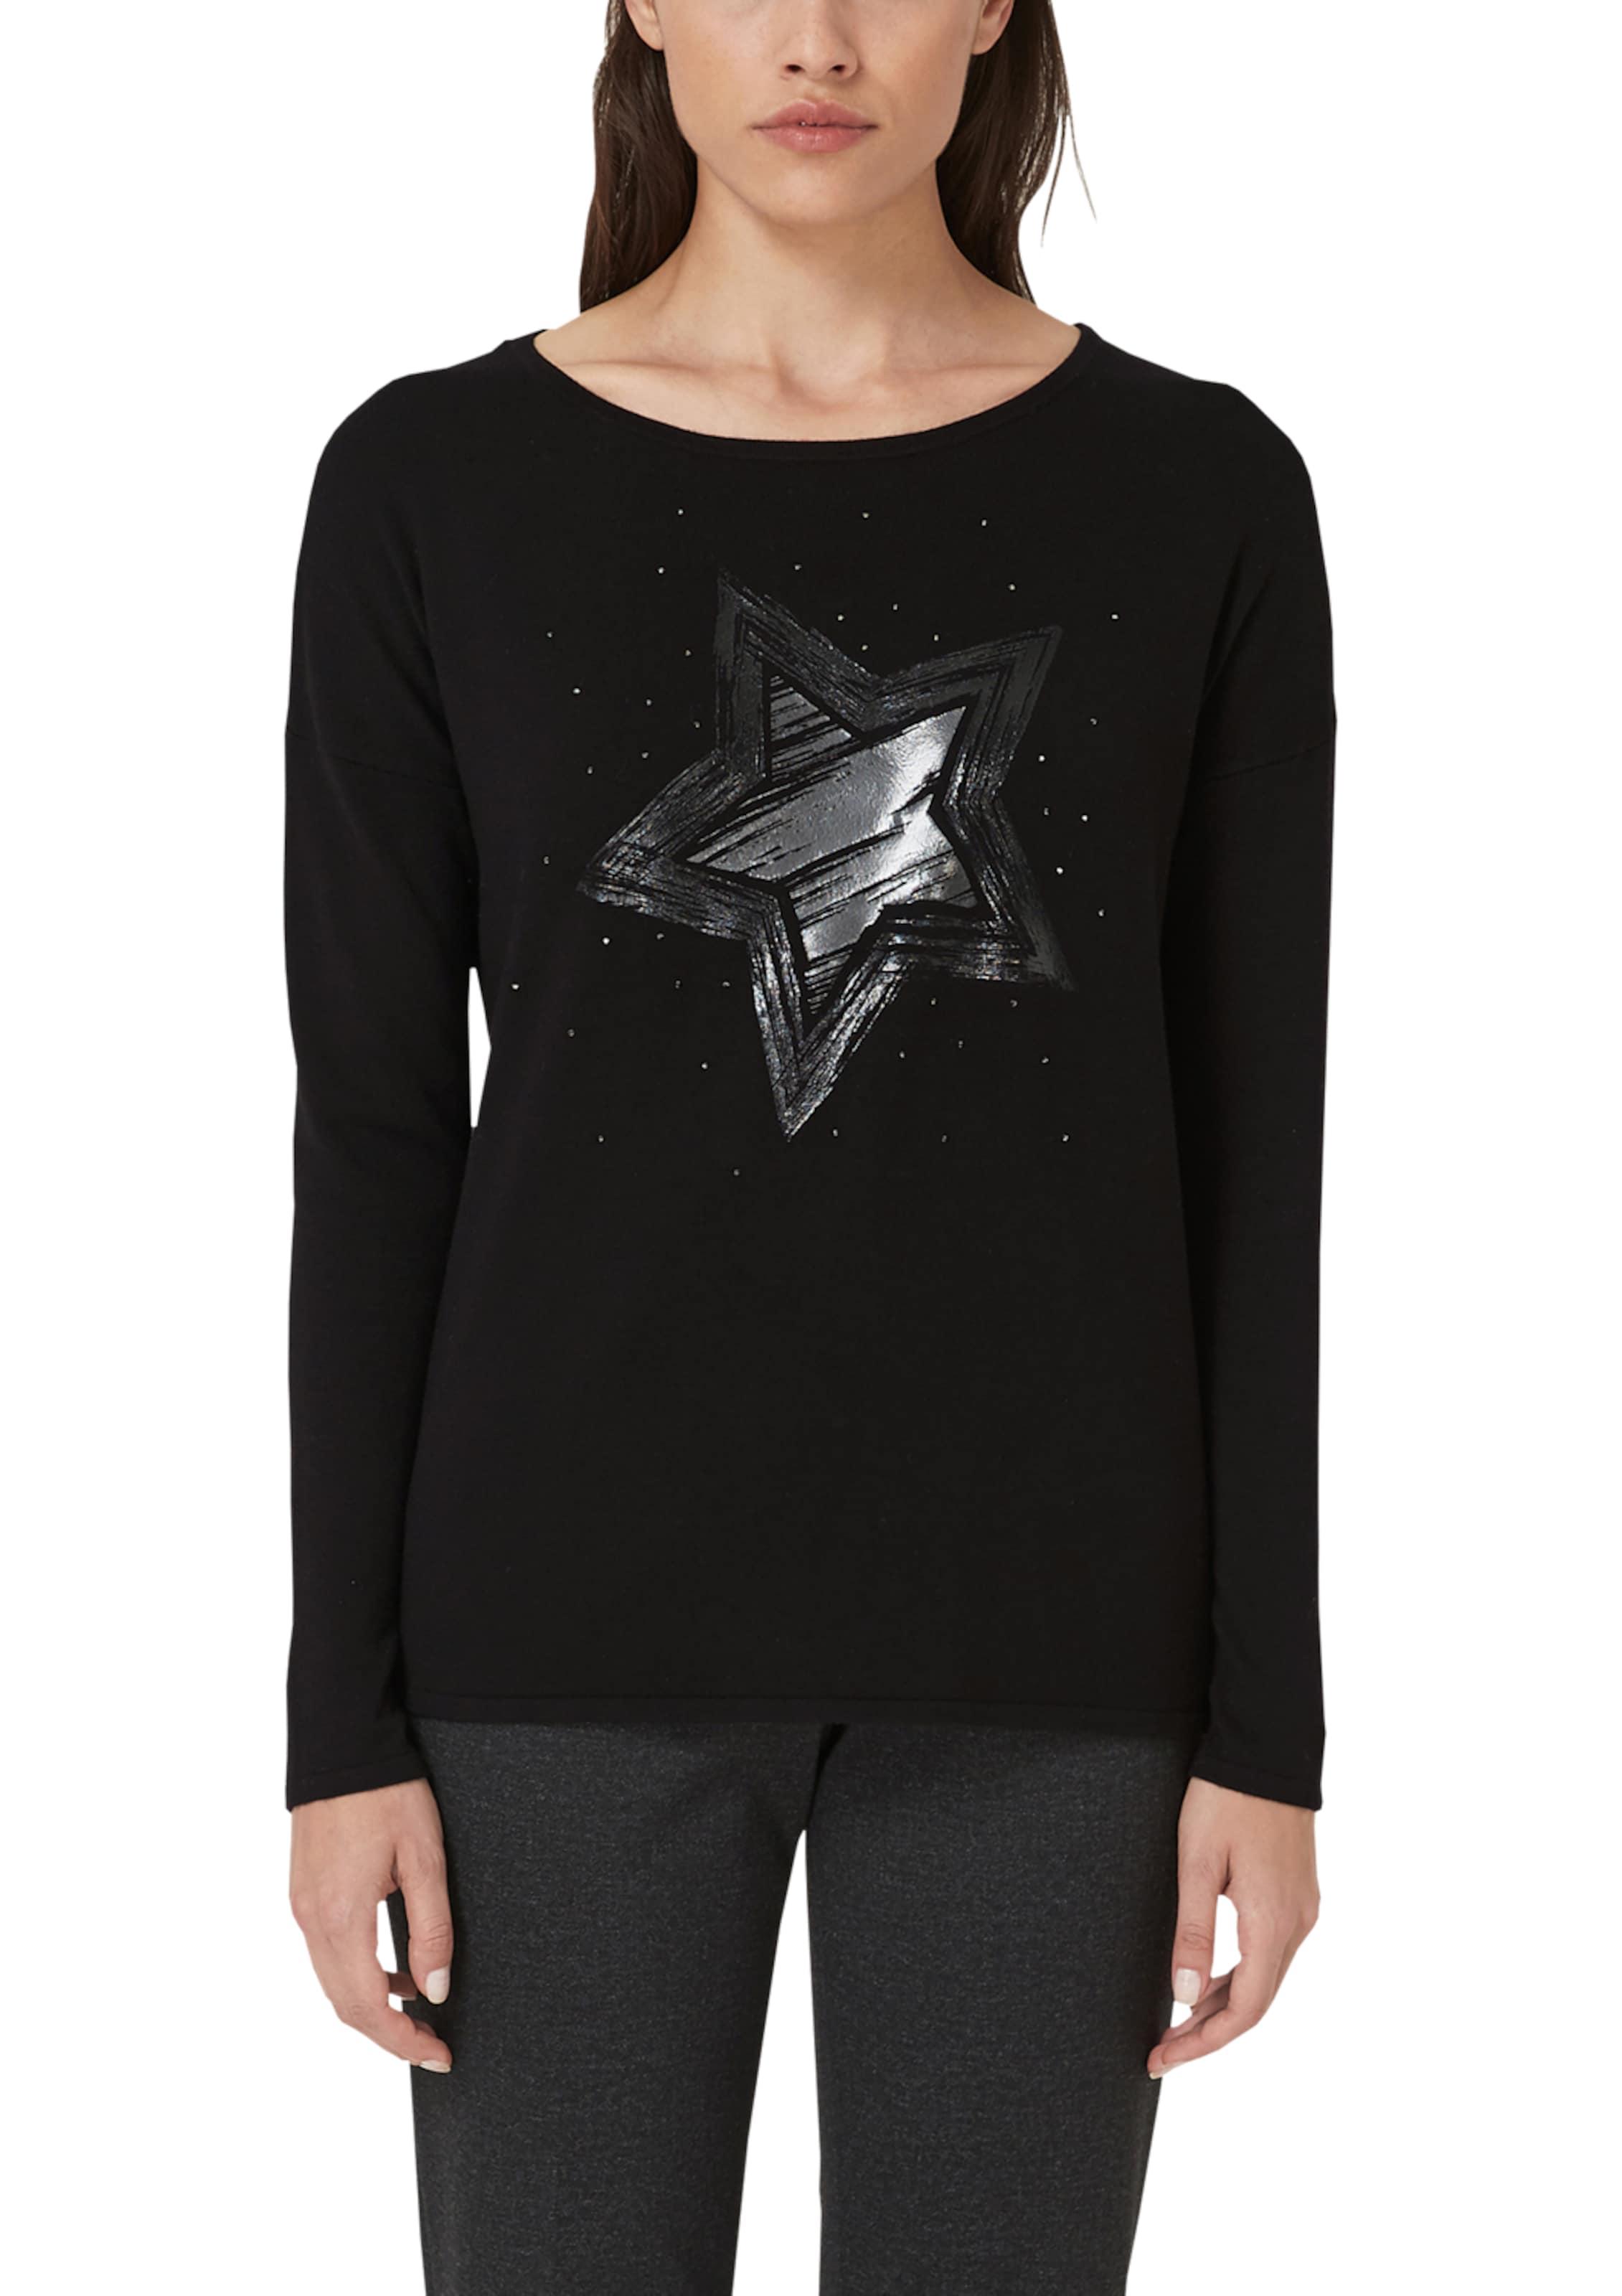 oliver S Label Pullover SchwarzSilber Black In 8wPyNnmvO0